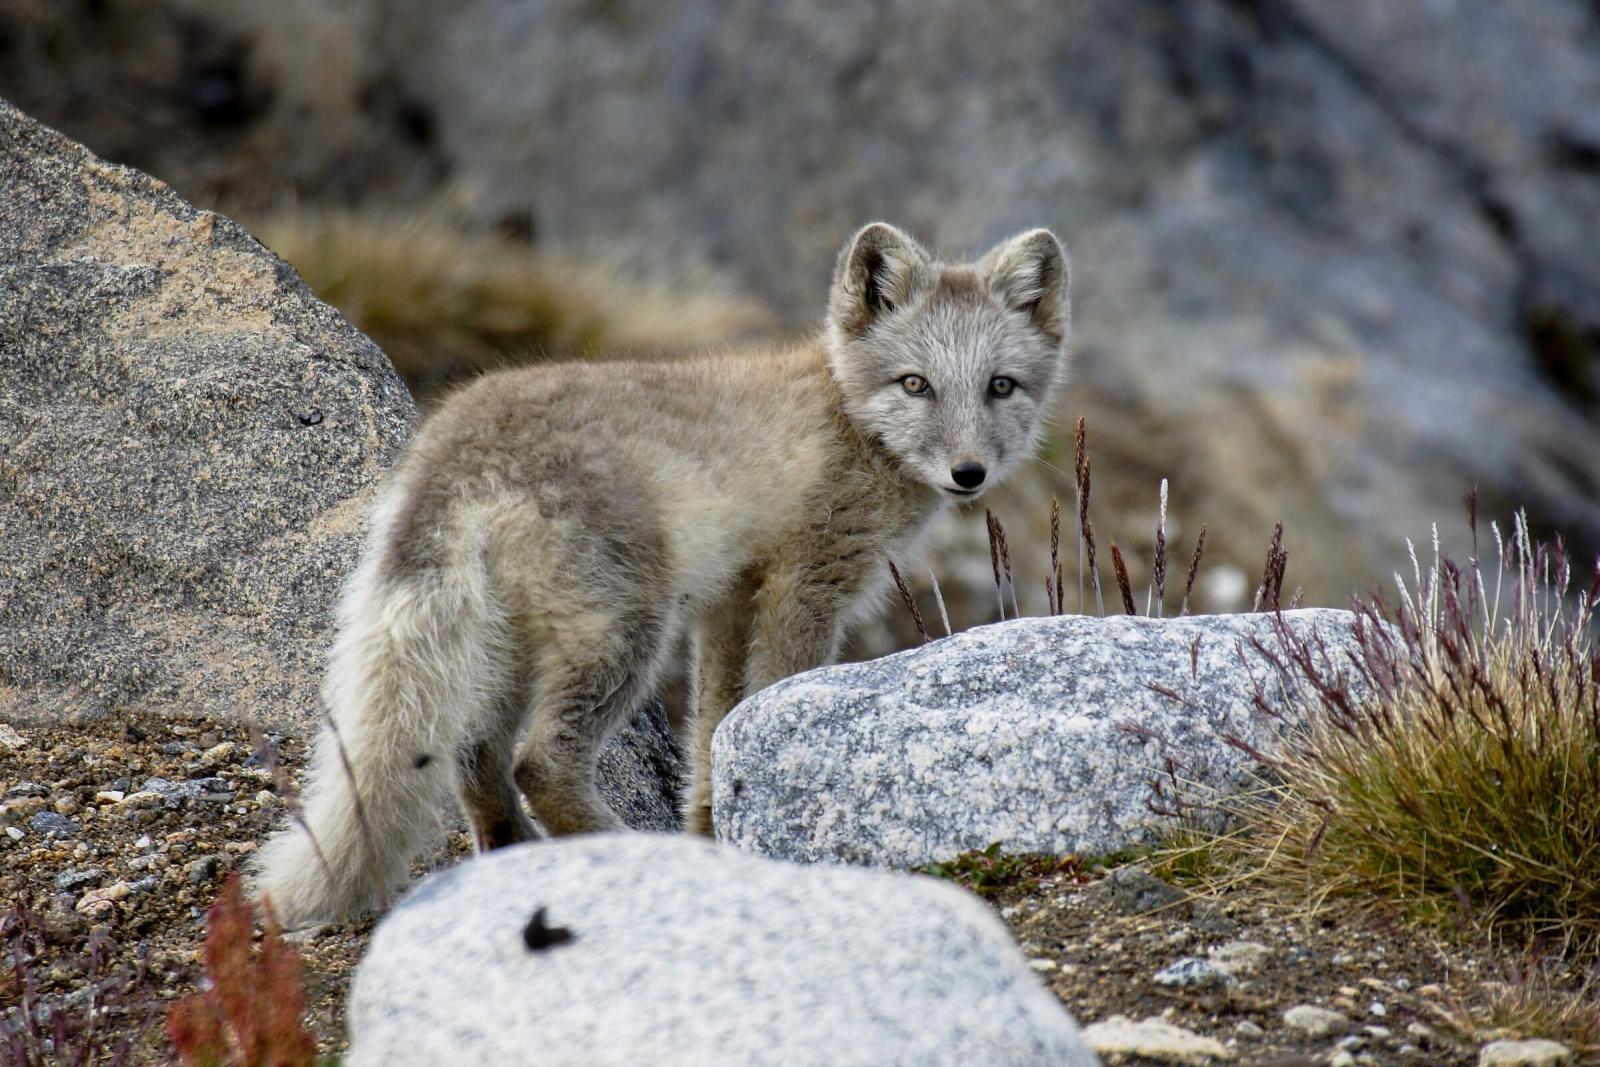 Polar fox spotted on a field. Photo by Aqqa Rosing Asvid.